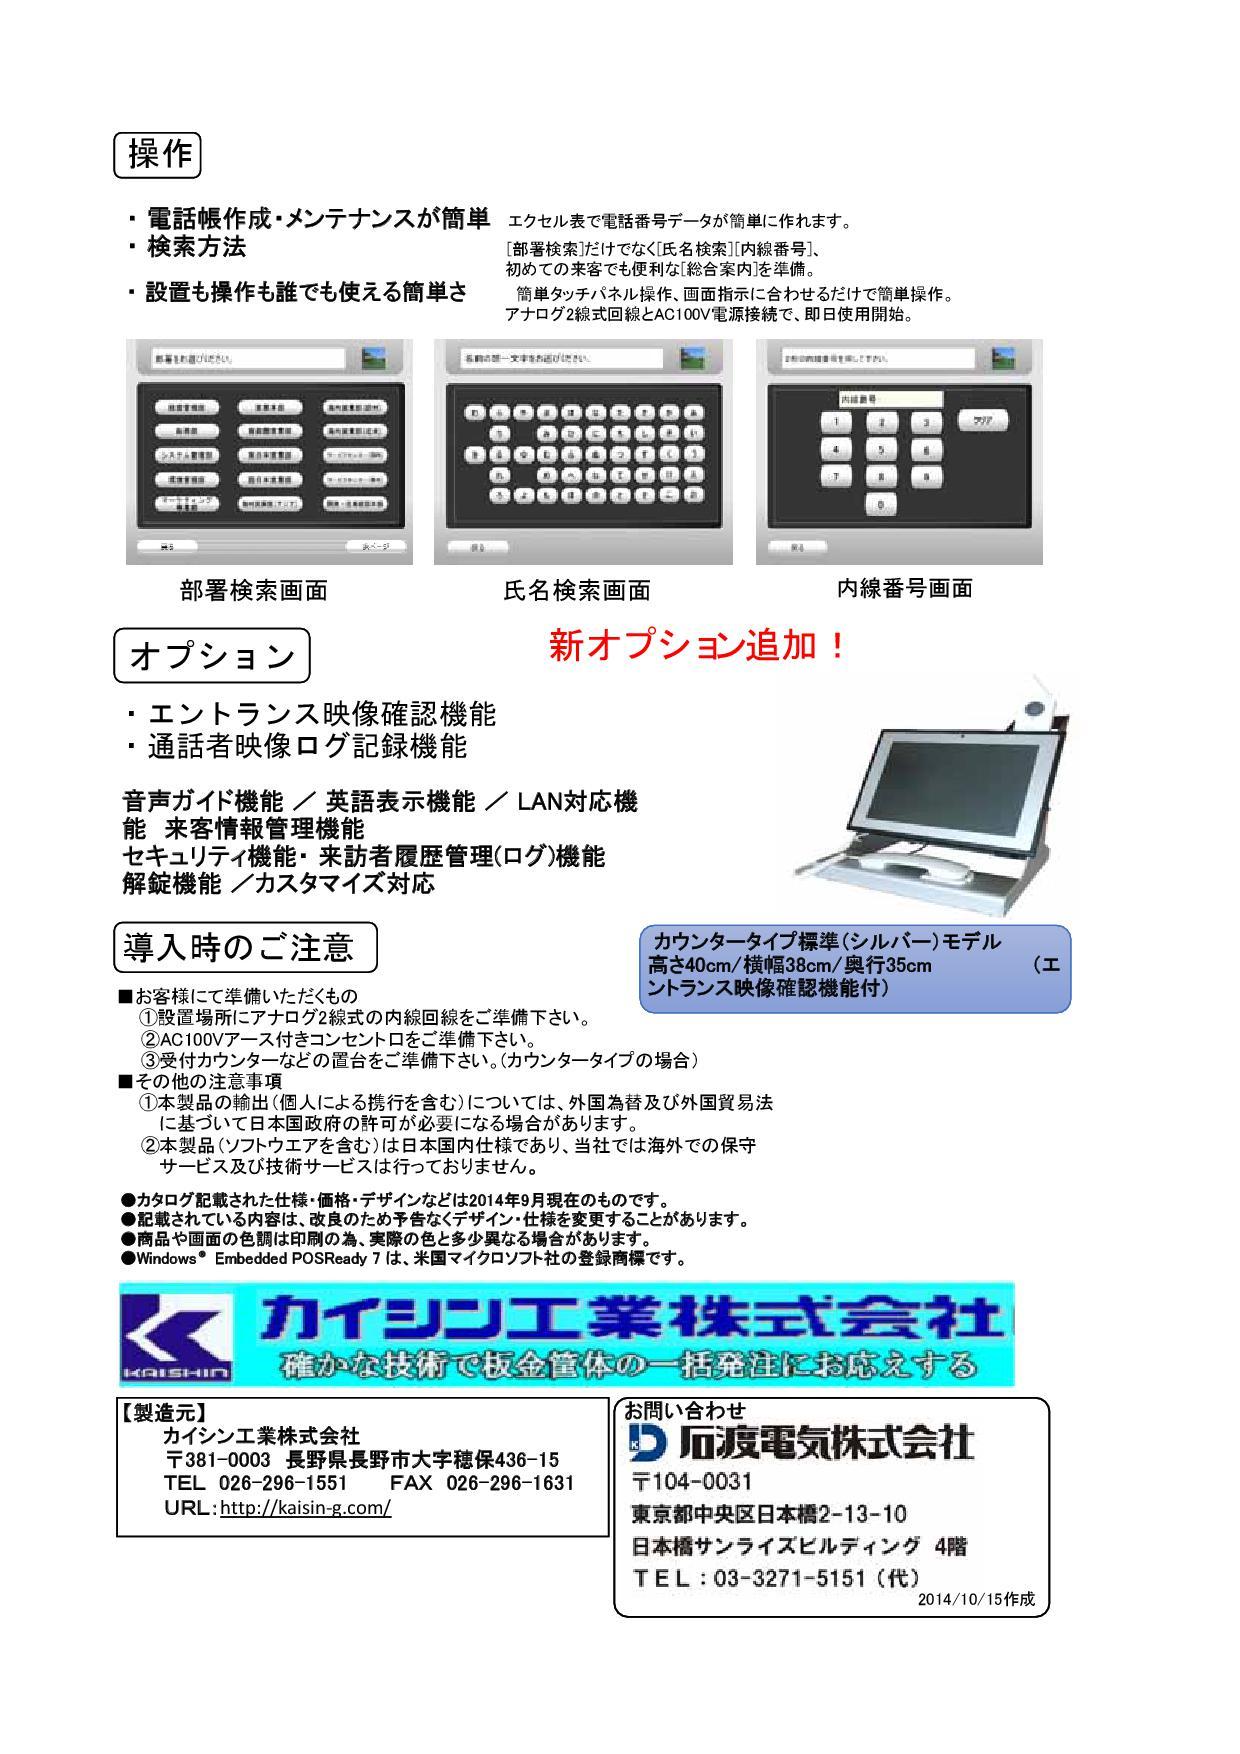 item_news_KAISHIN_uketsuke_system20141126-002